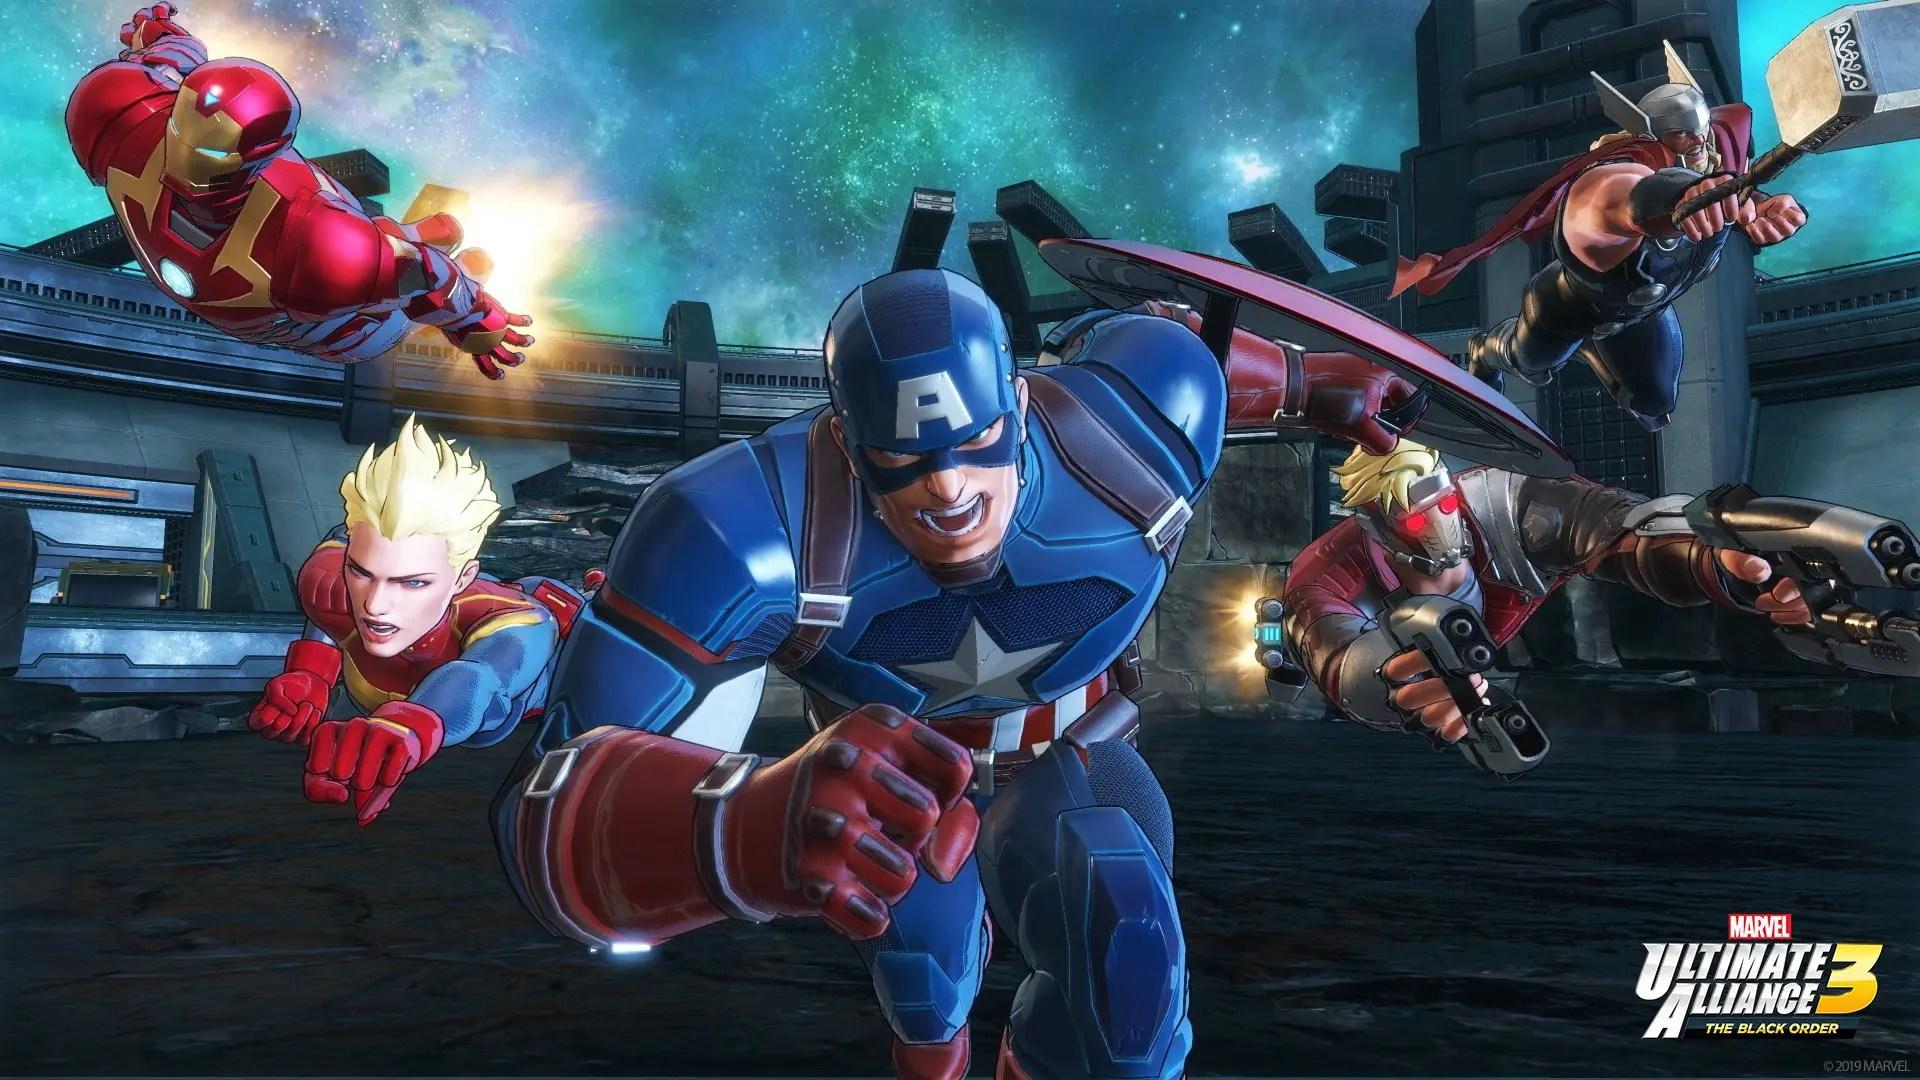 Marvel Ultimate Alliance 3: The Black Order E3 2019 Screenshot 11